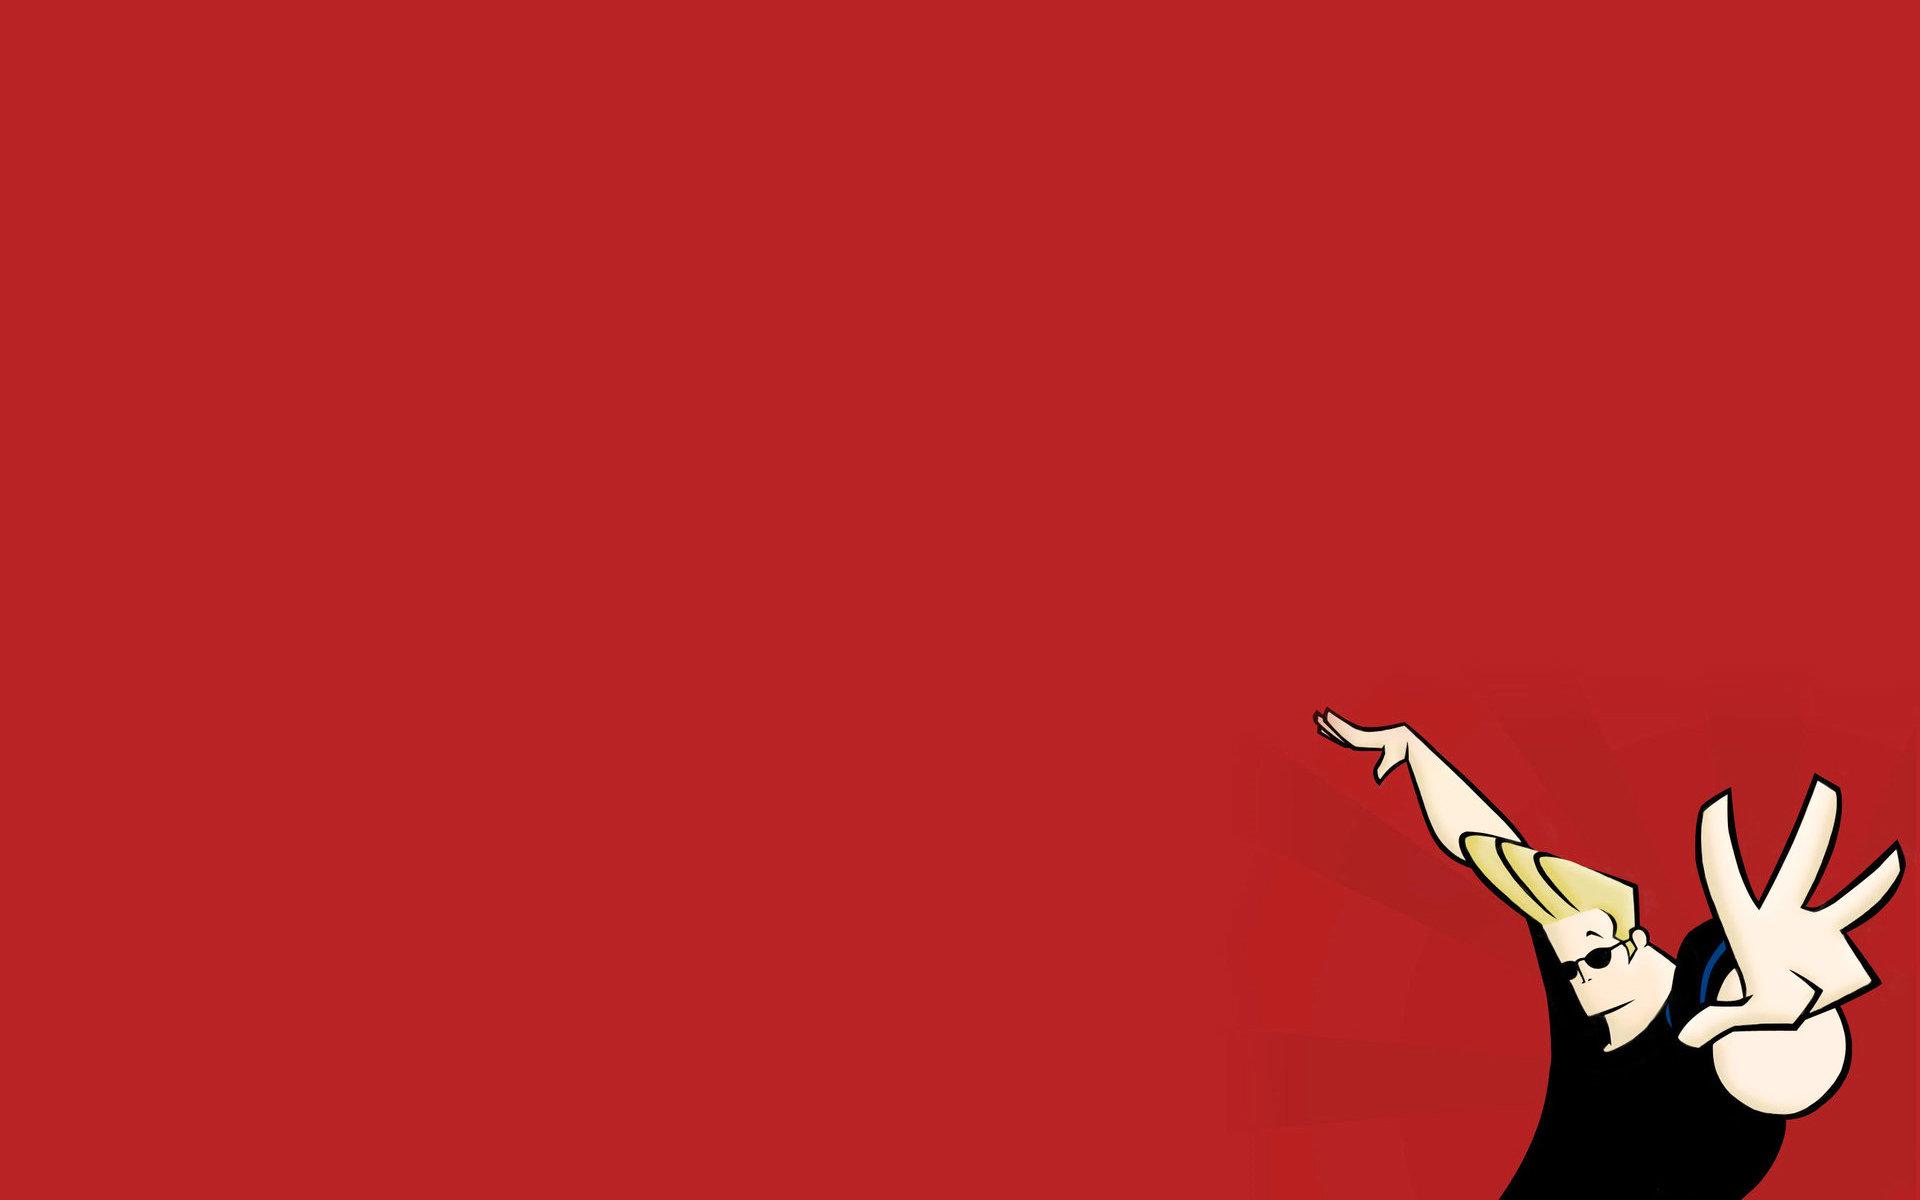 Johnny Bravo Wallpapers Hd For Desktop Backgrounds